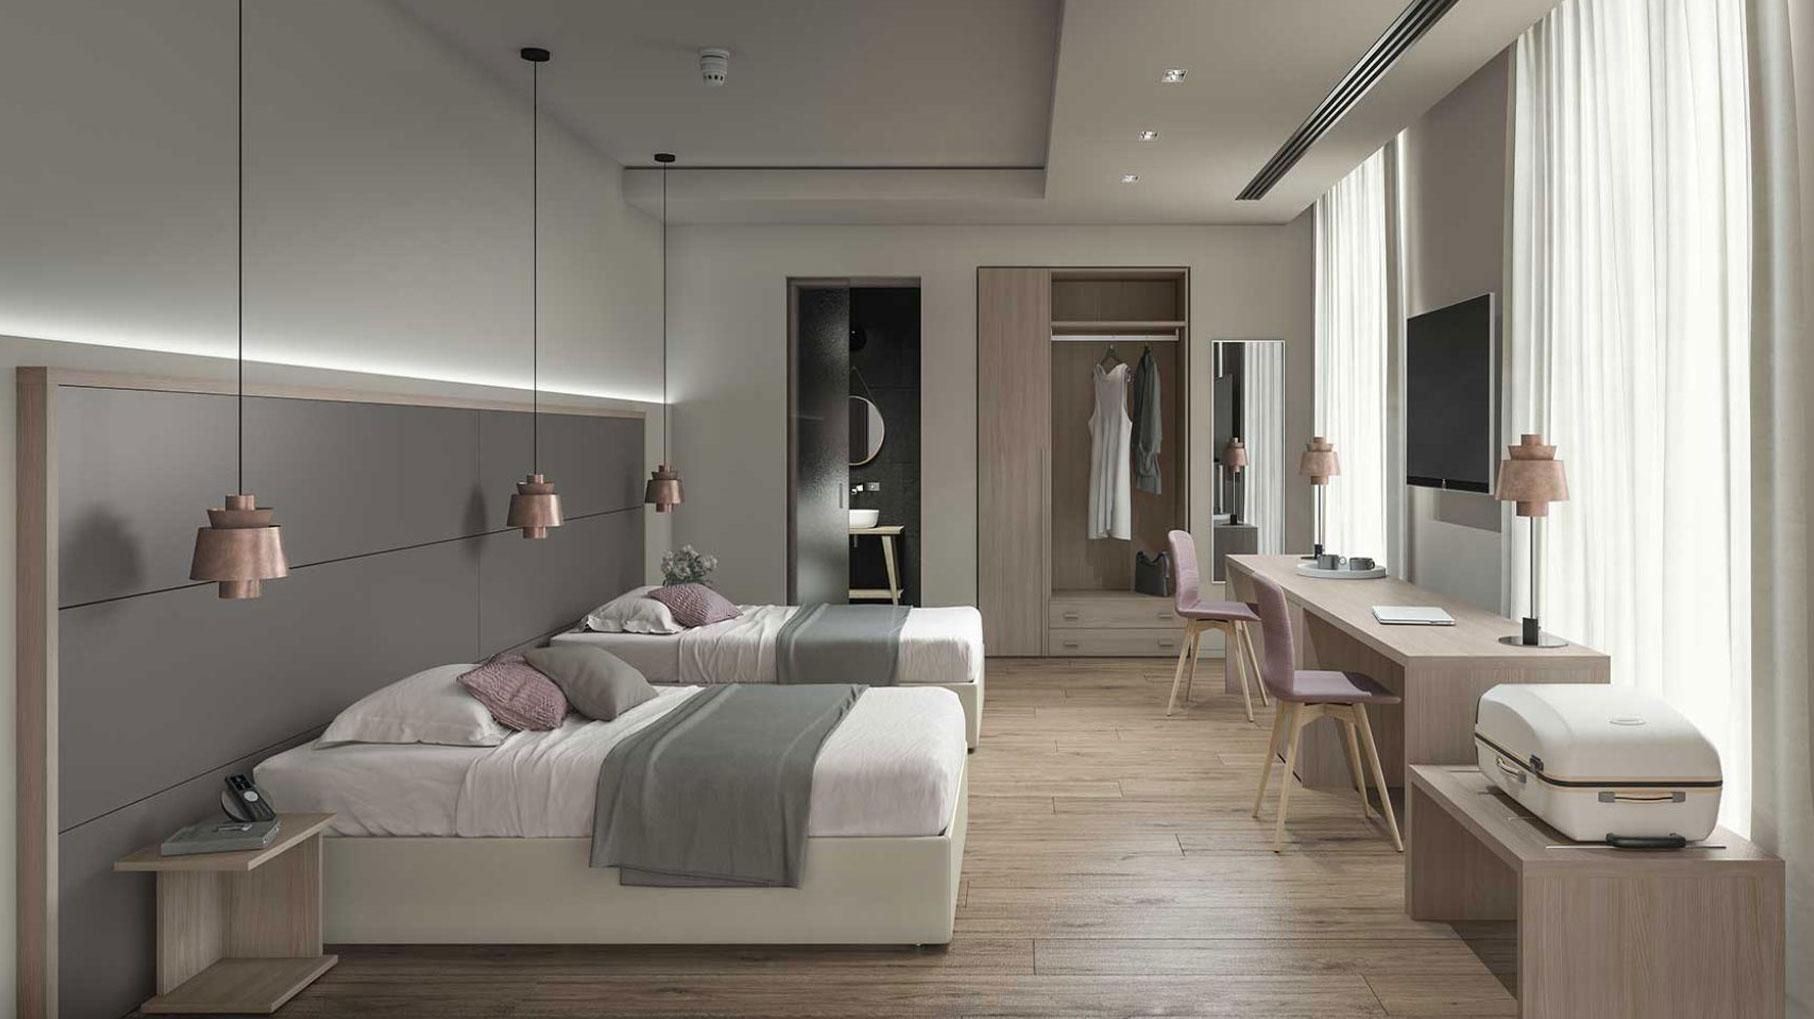 Proposte camere albergo for Camere albergo dwg